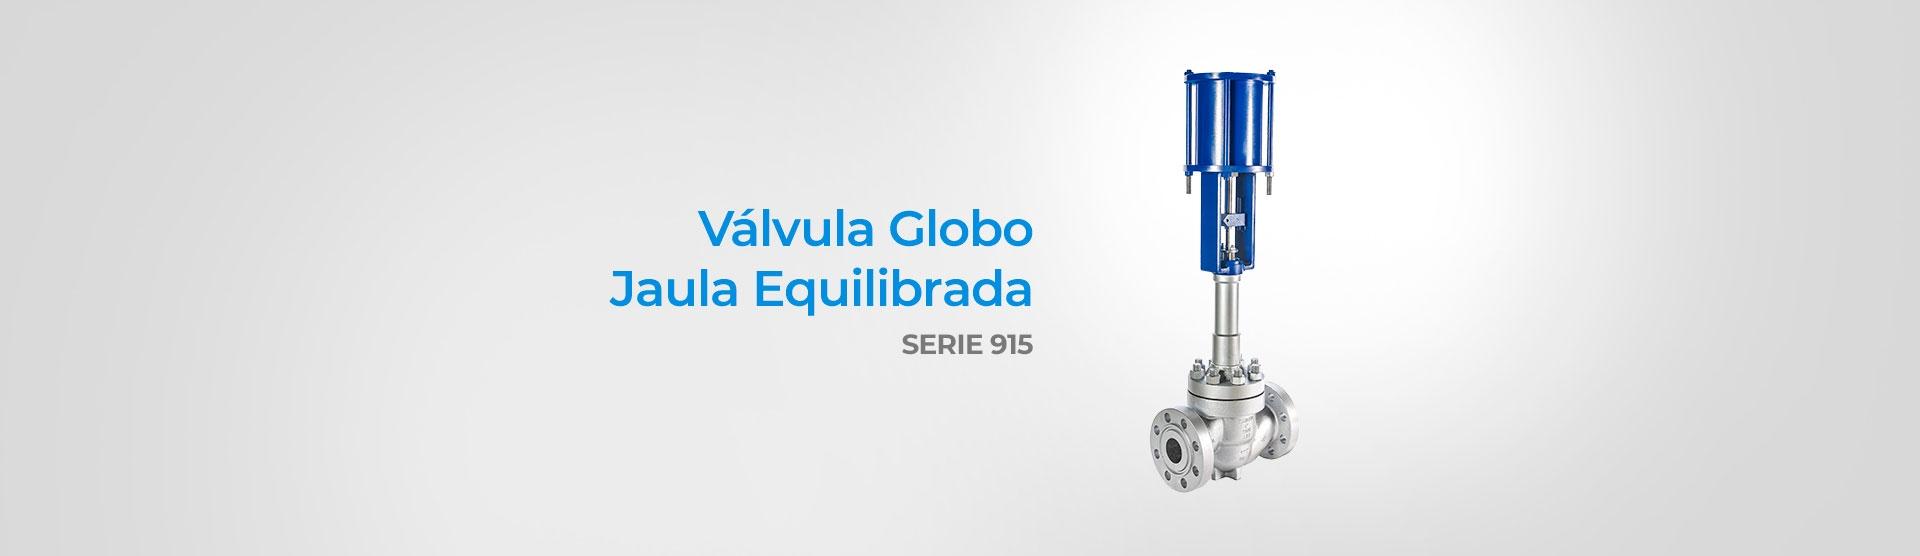 Válvula Globo Jaula Equilibrada (Serie 915)